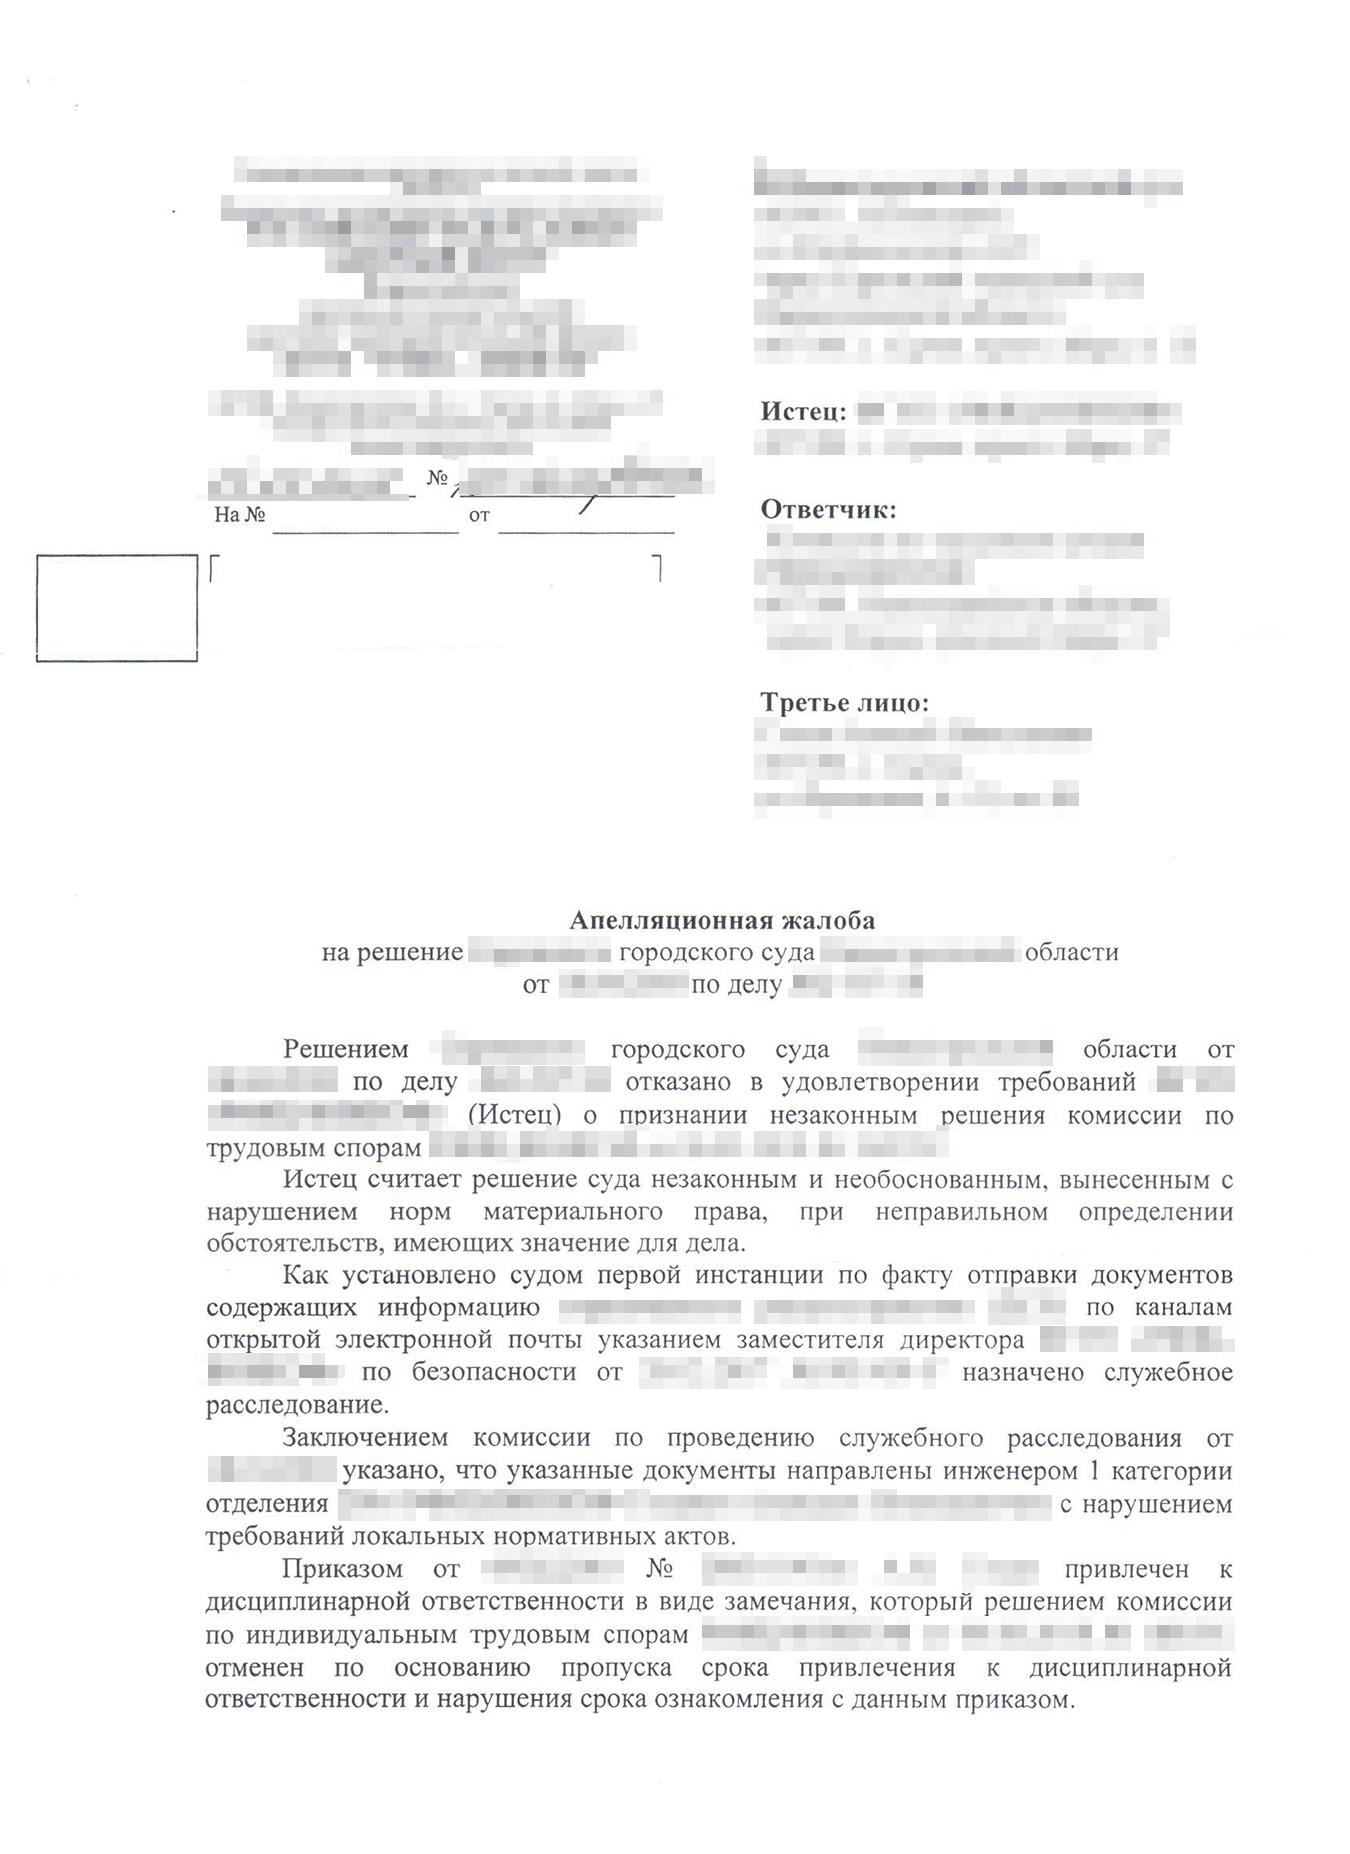 Апелляционная жалоба работодателя